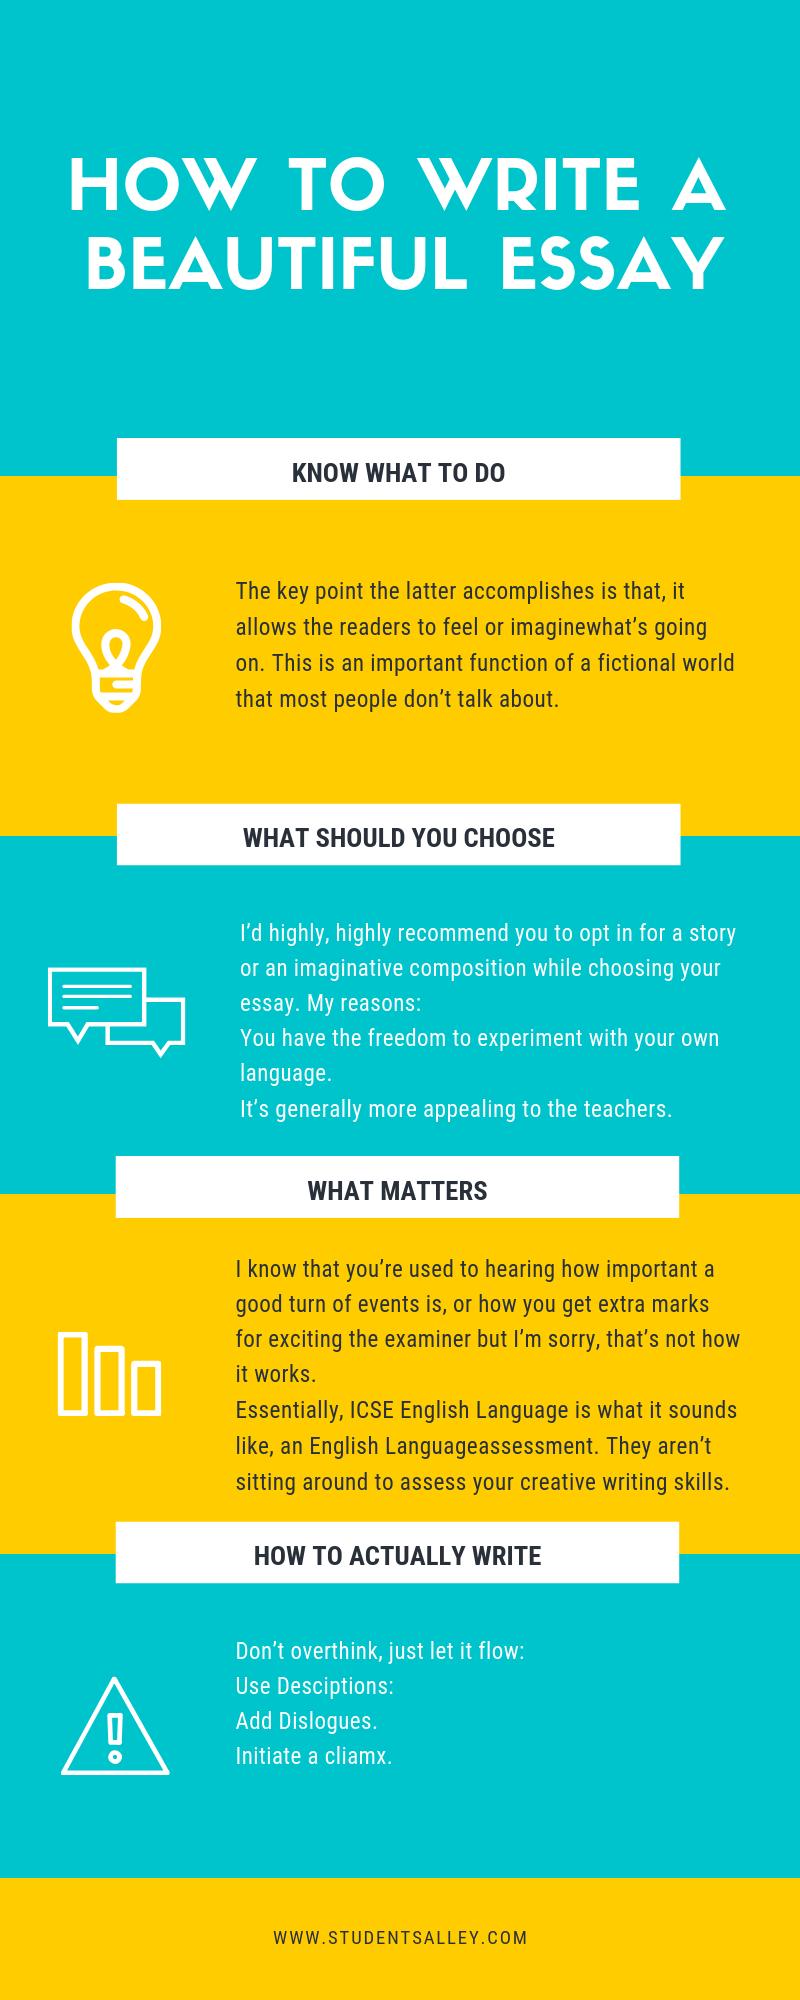 How To Write An Essay Professional Development For Teacher Power Of Social Media On